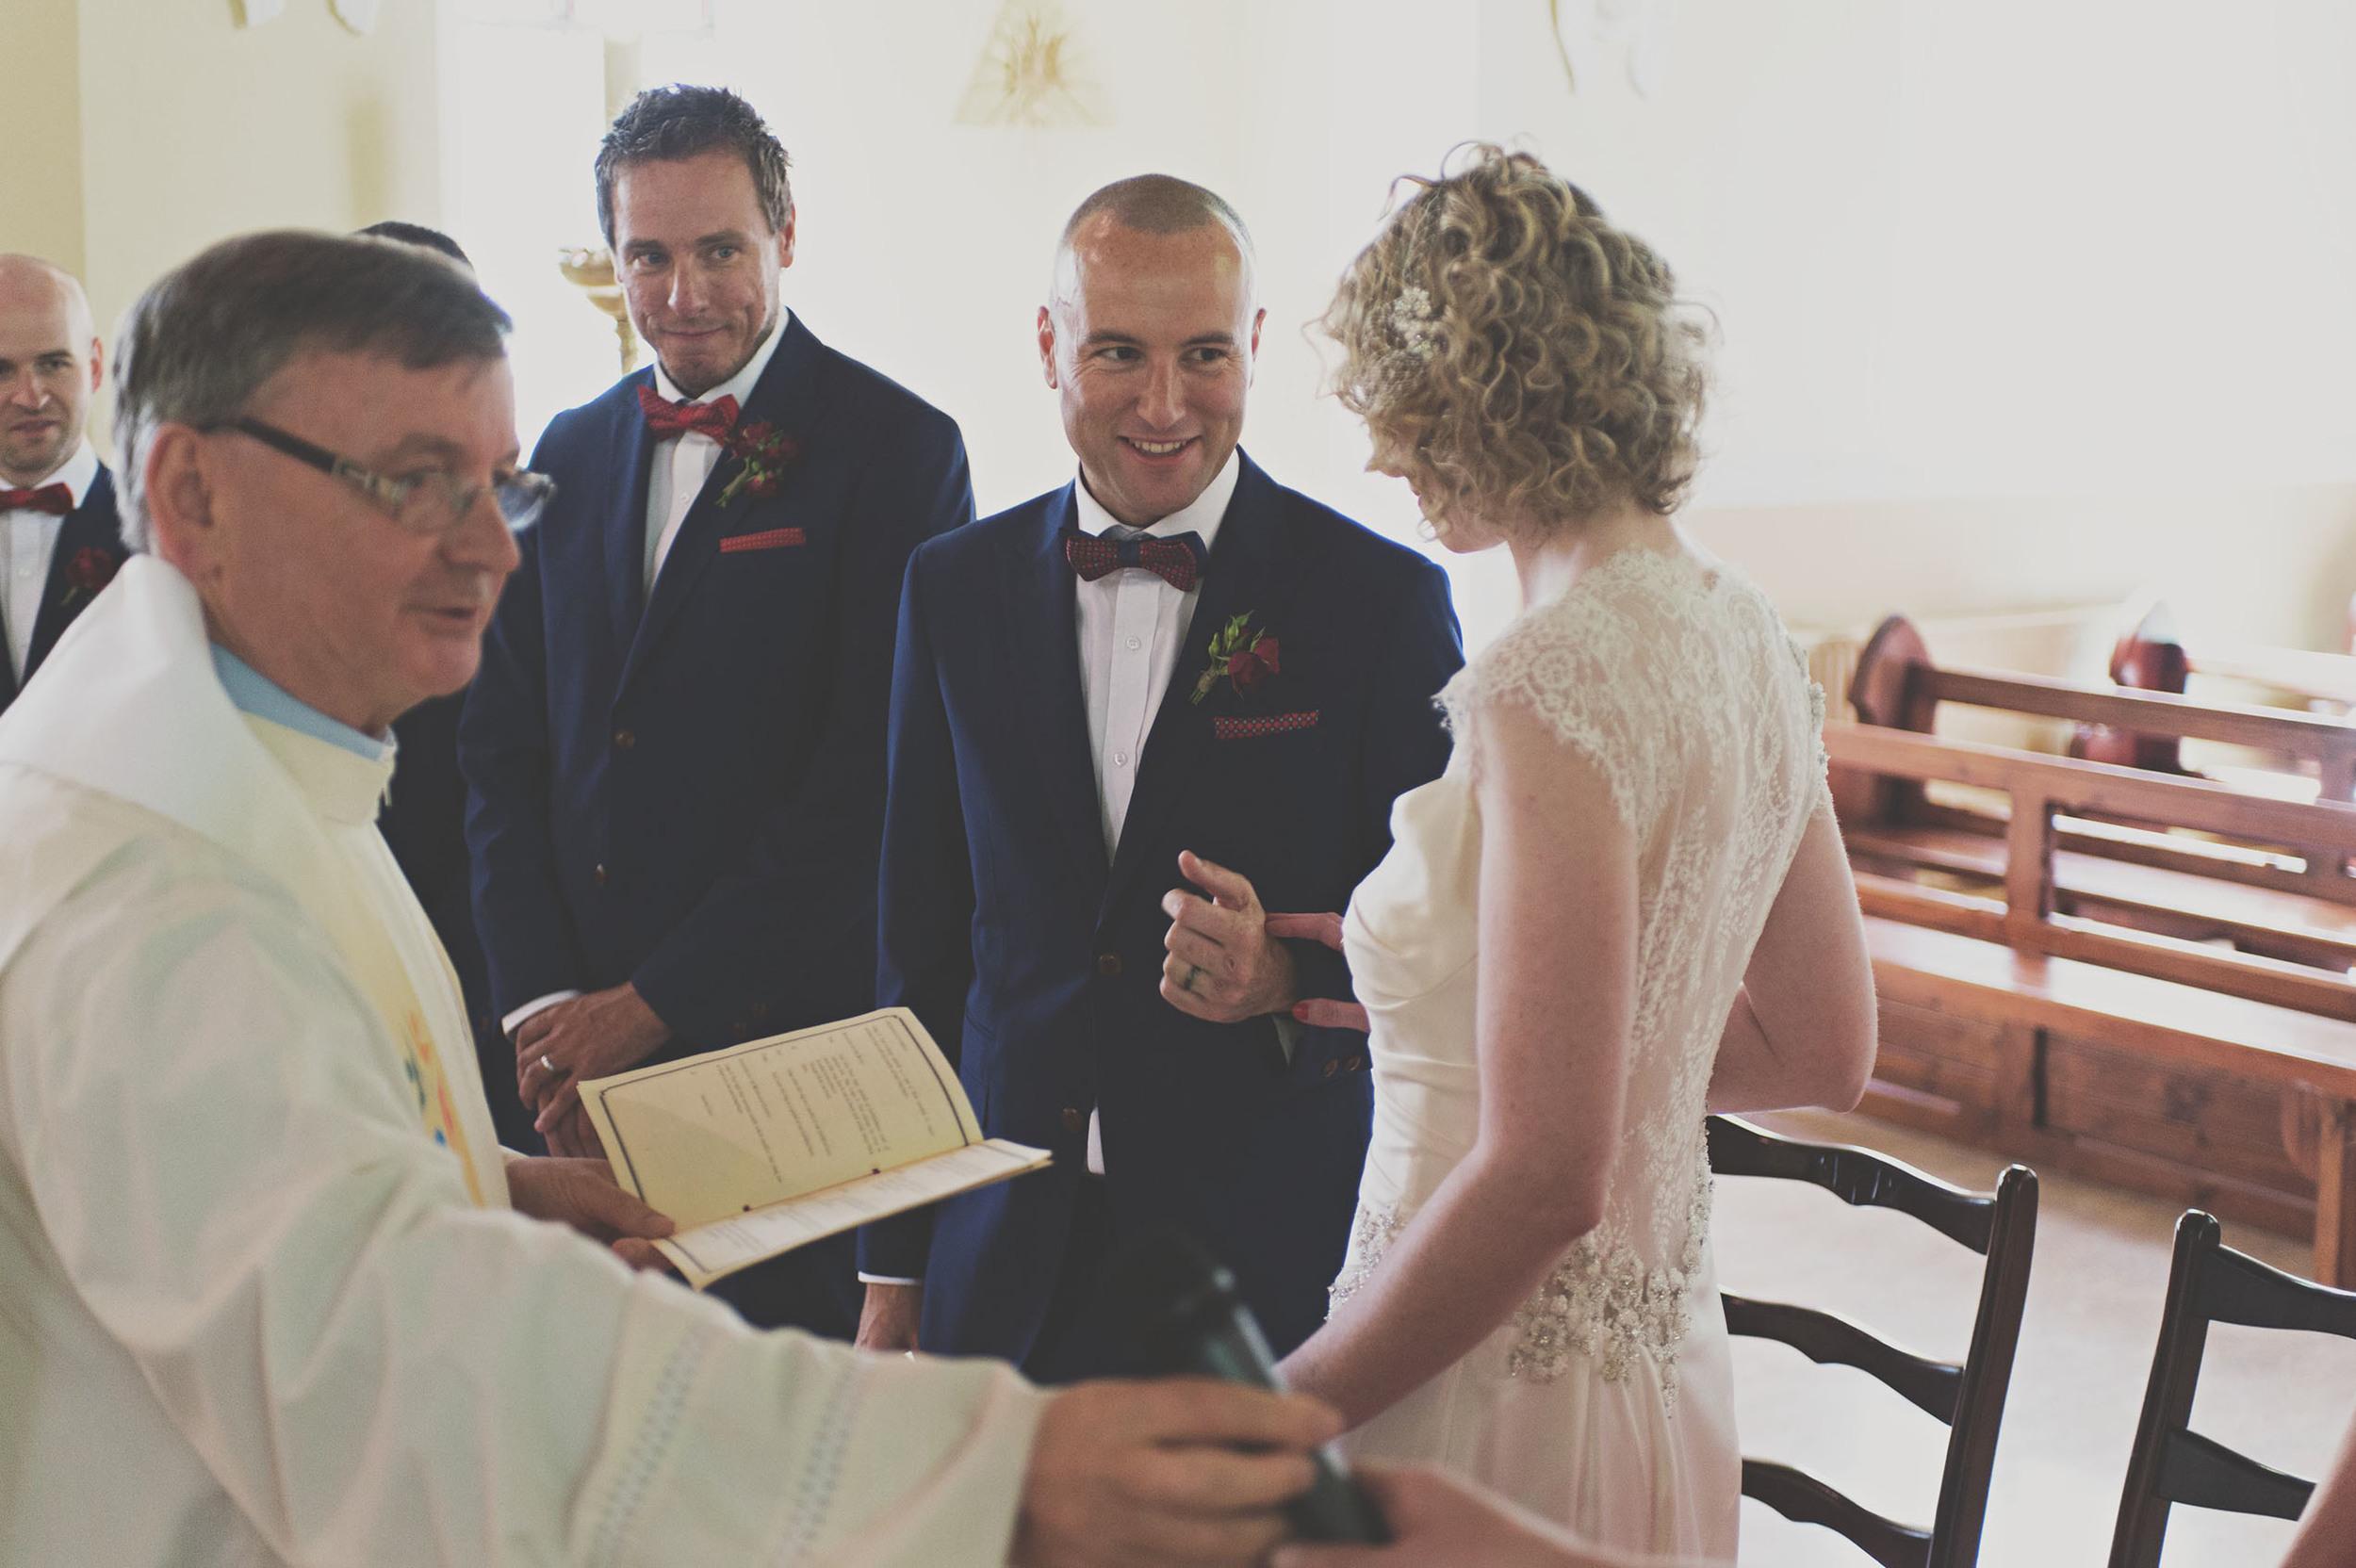 Tanya & Paul's Rathsallagh Wedding 038.jpg